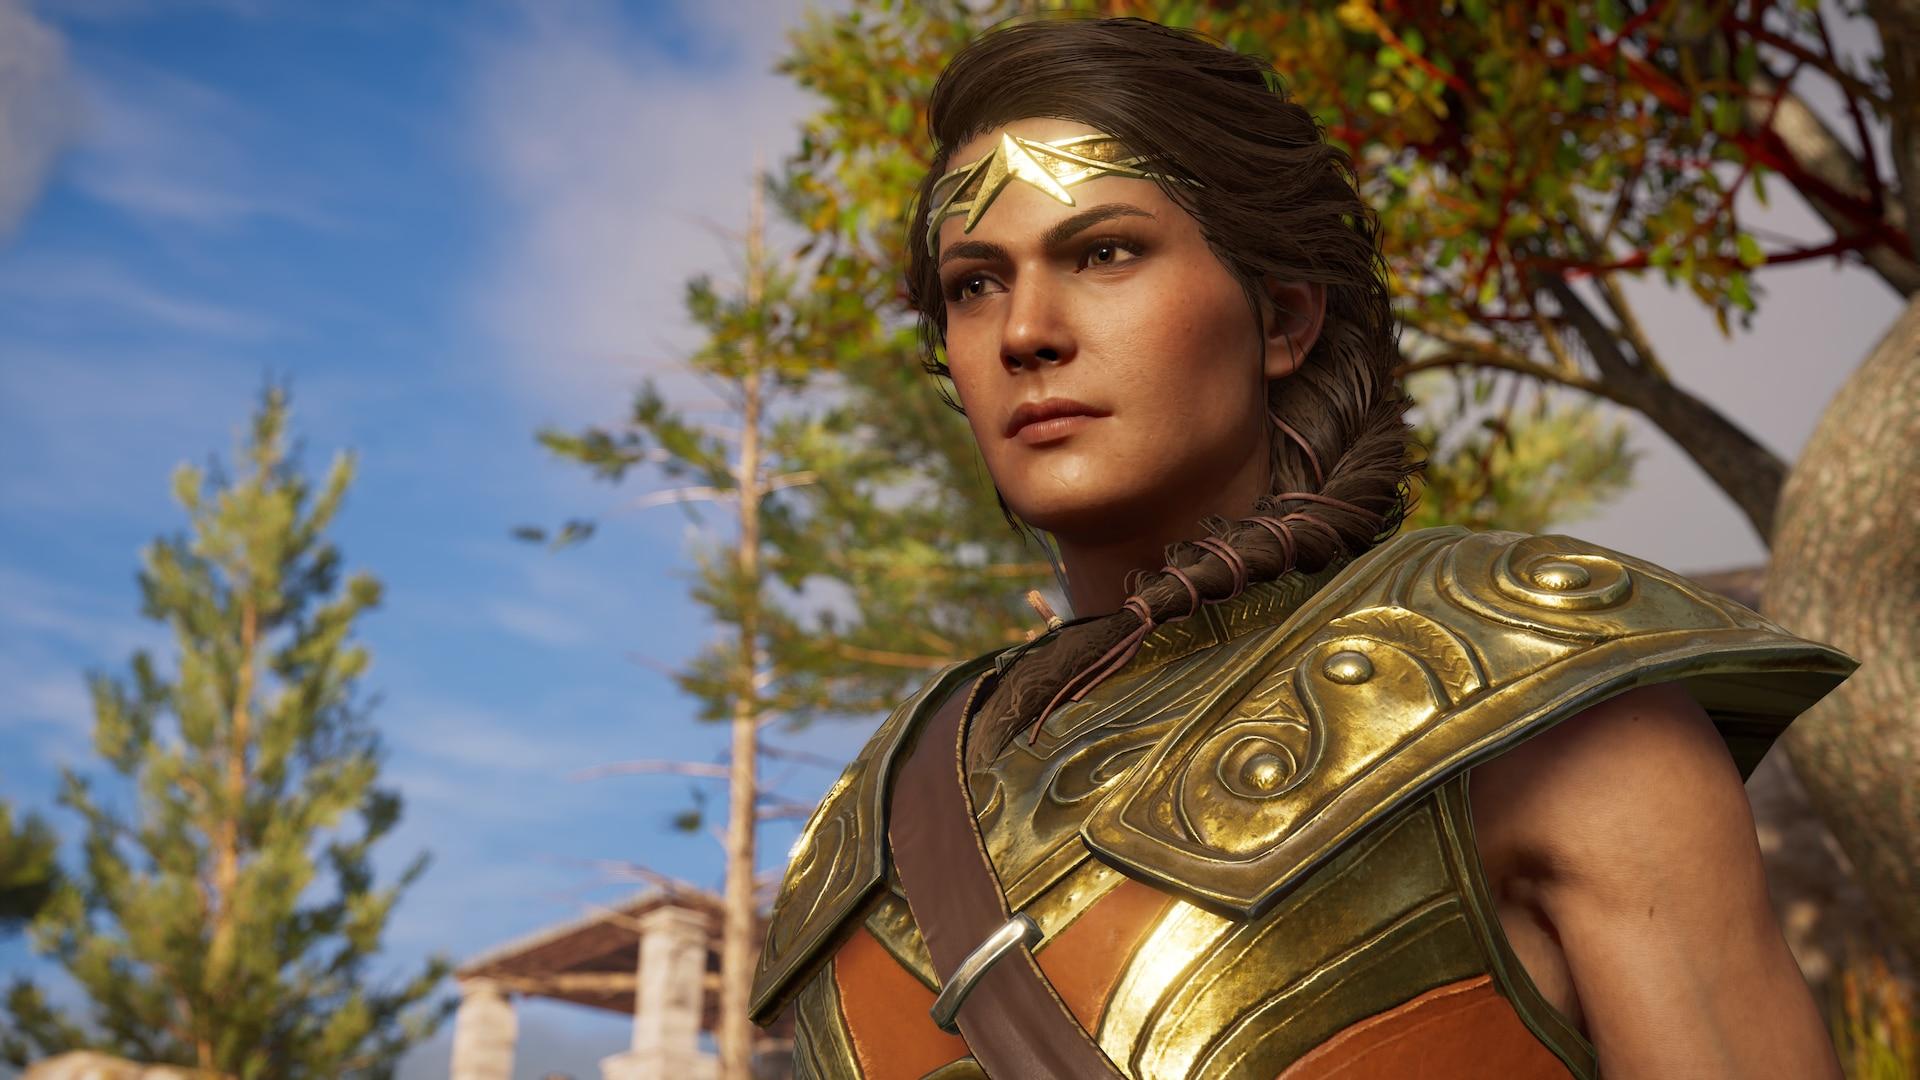 zbkjunkl.jpg - Assassin's Creed: Odyssey